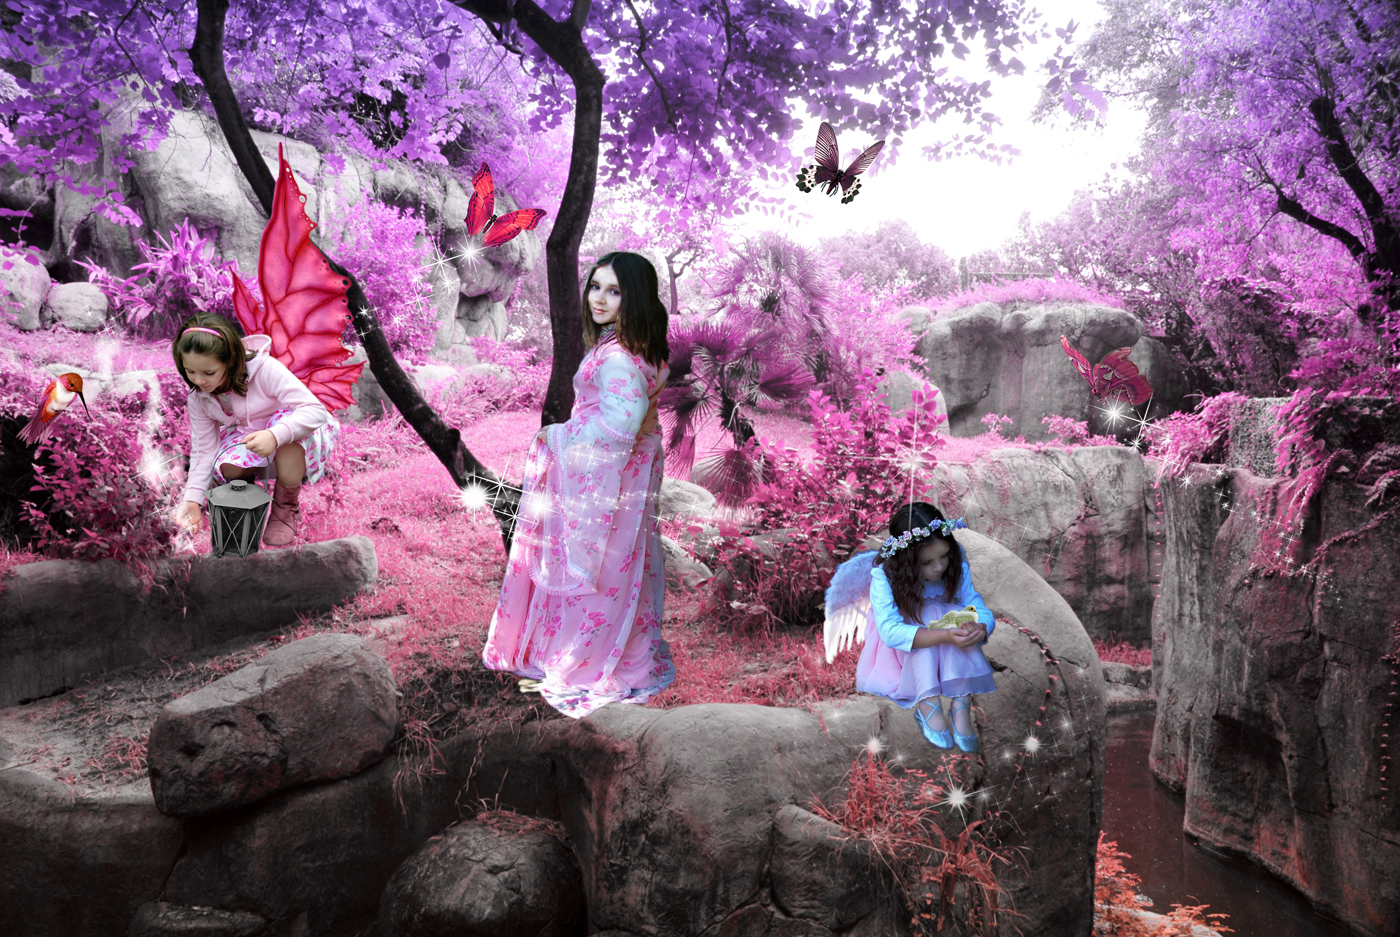 Little Princesses by xCherryxLipsx